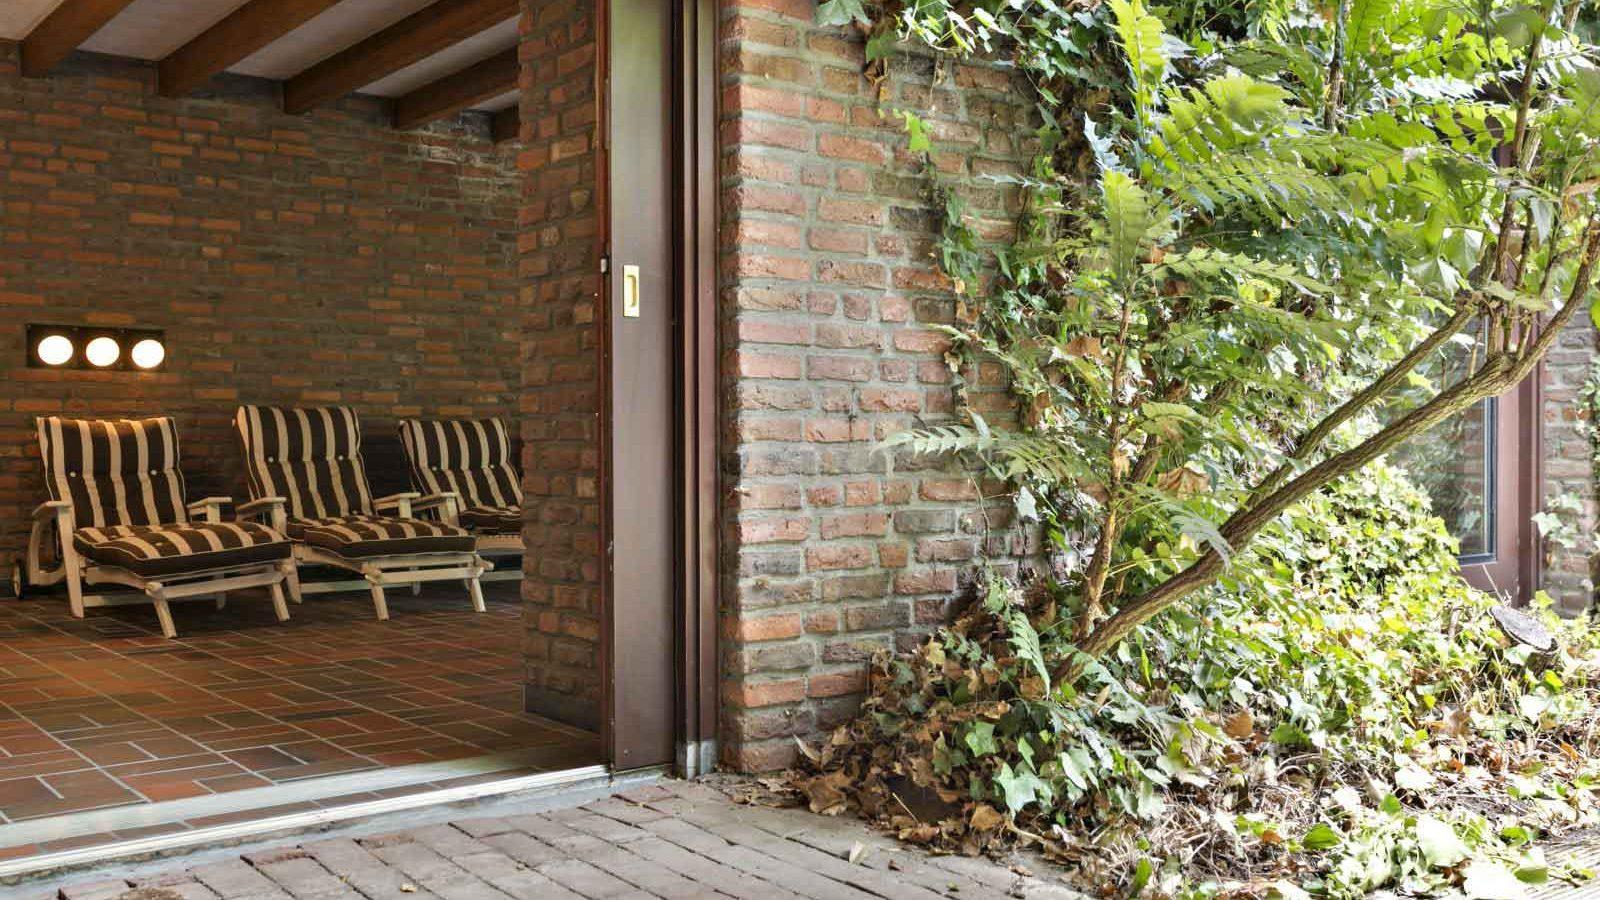 Tintelberg15Roermond-71-1600x1067